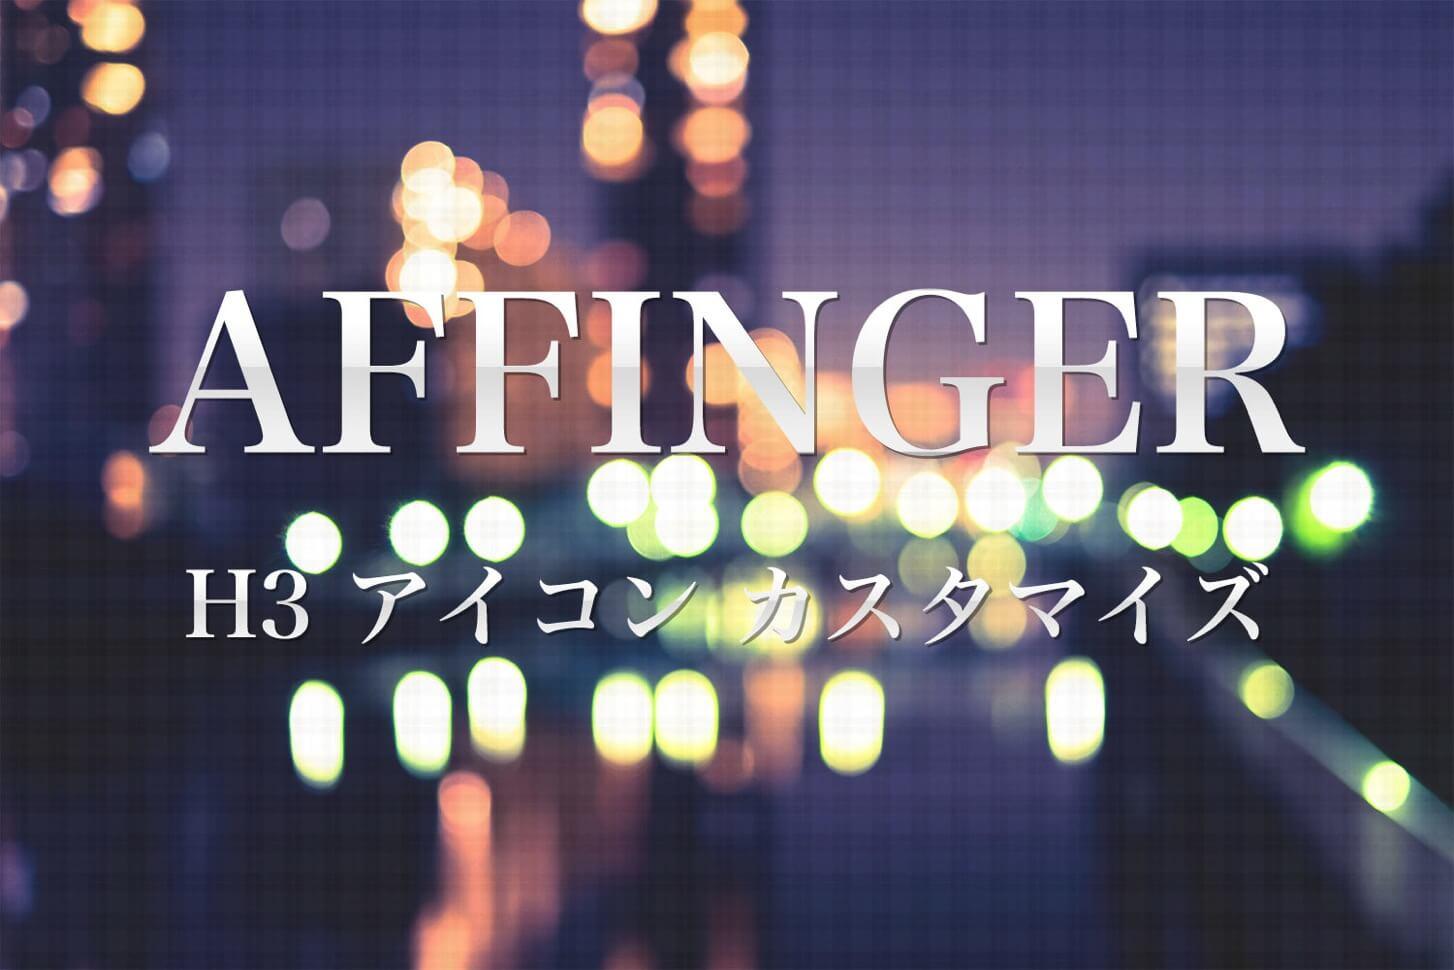 Affinger h3 icon customize